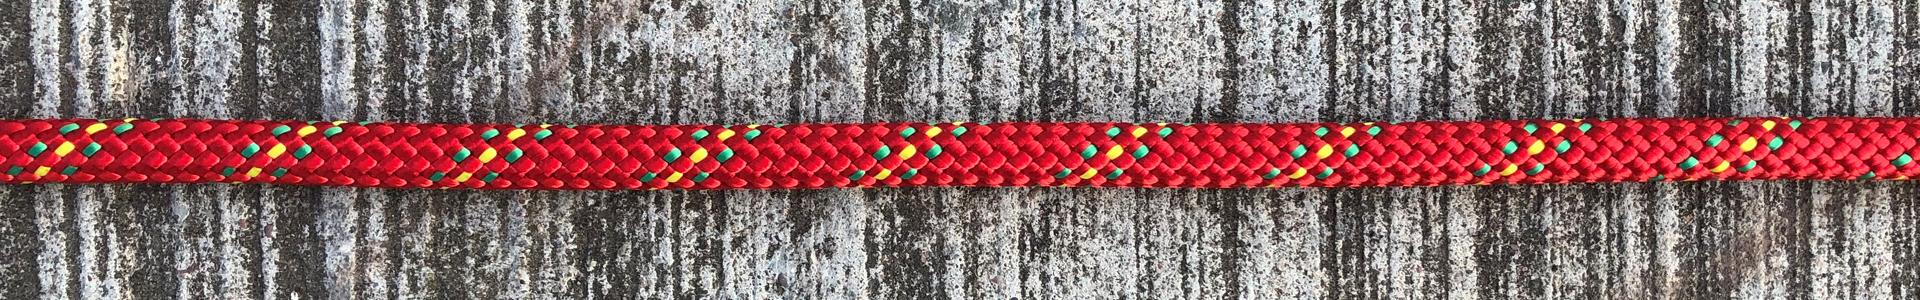 nexus - island ropes image